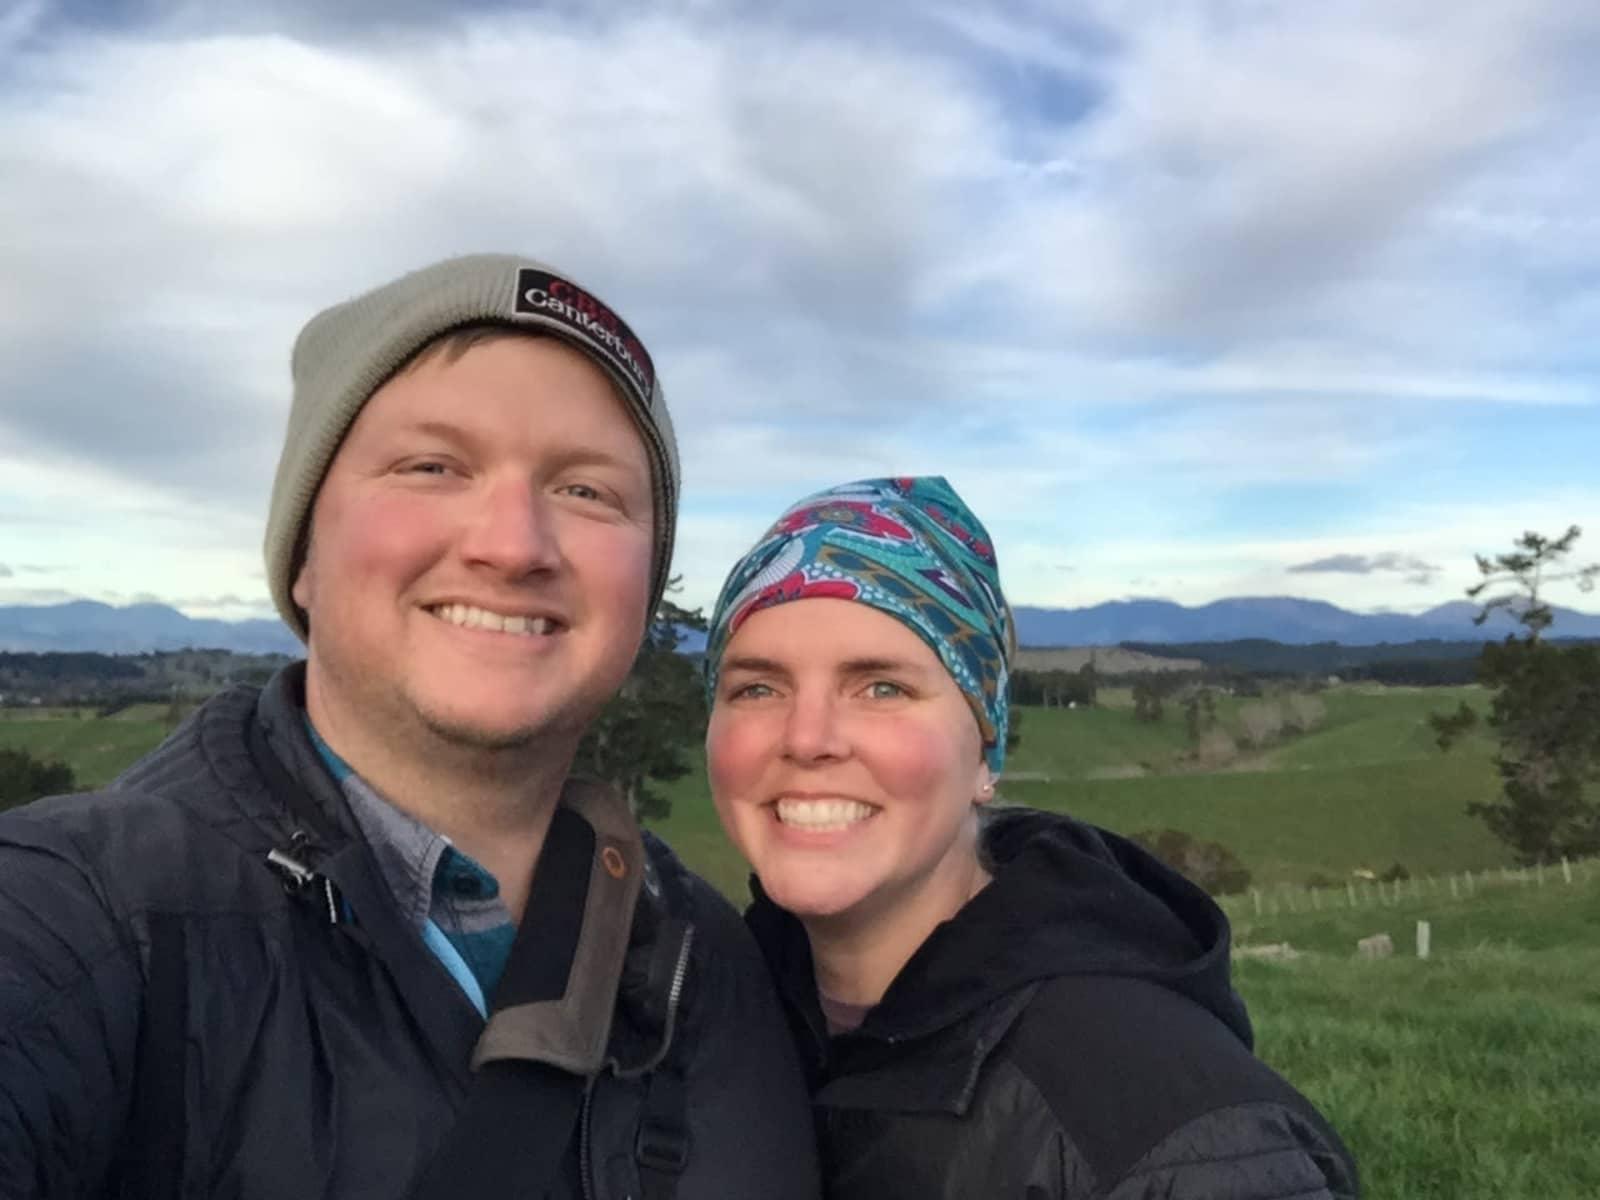 Travis & Elizabeth from Hamilton, New Zealand